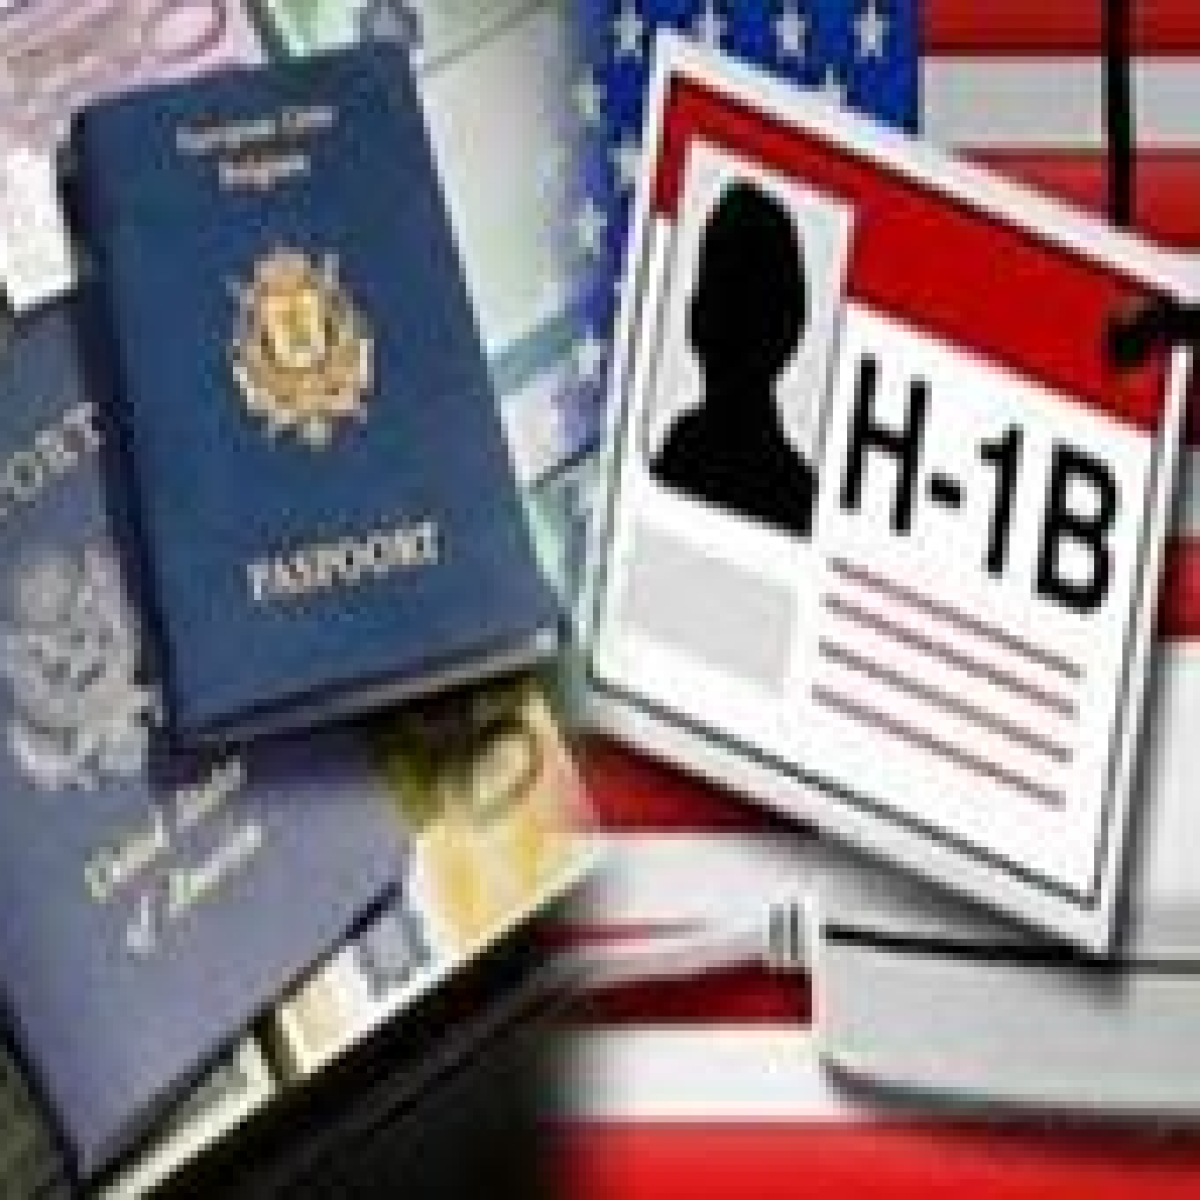 Big Increase In Denial Of H1-B Visas, Indian IT Firms Worst Hit: Study